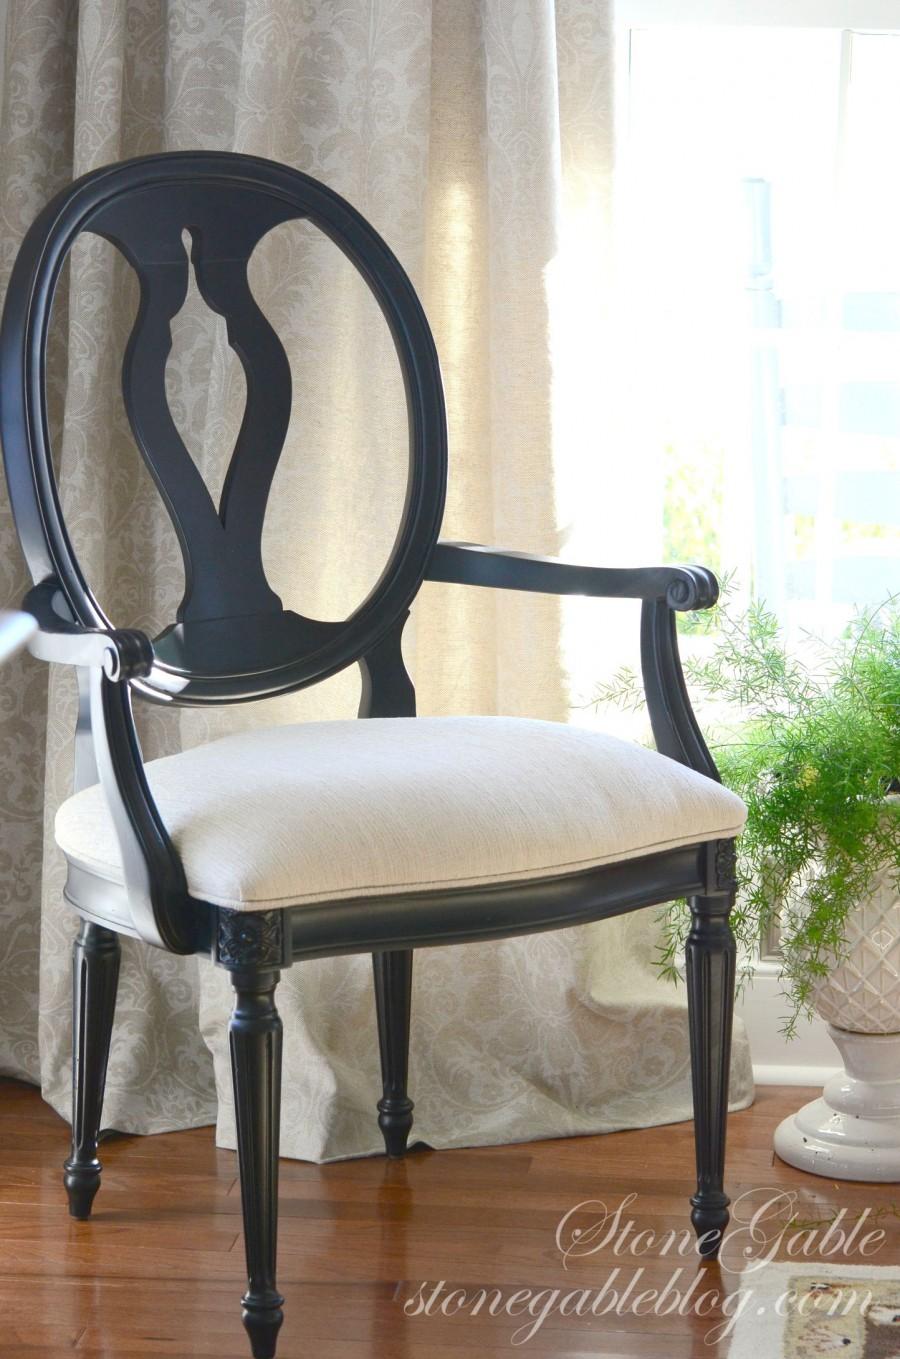 EVOLUTION OF A DINING ROOM-ballet chair-stonegableblog.com